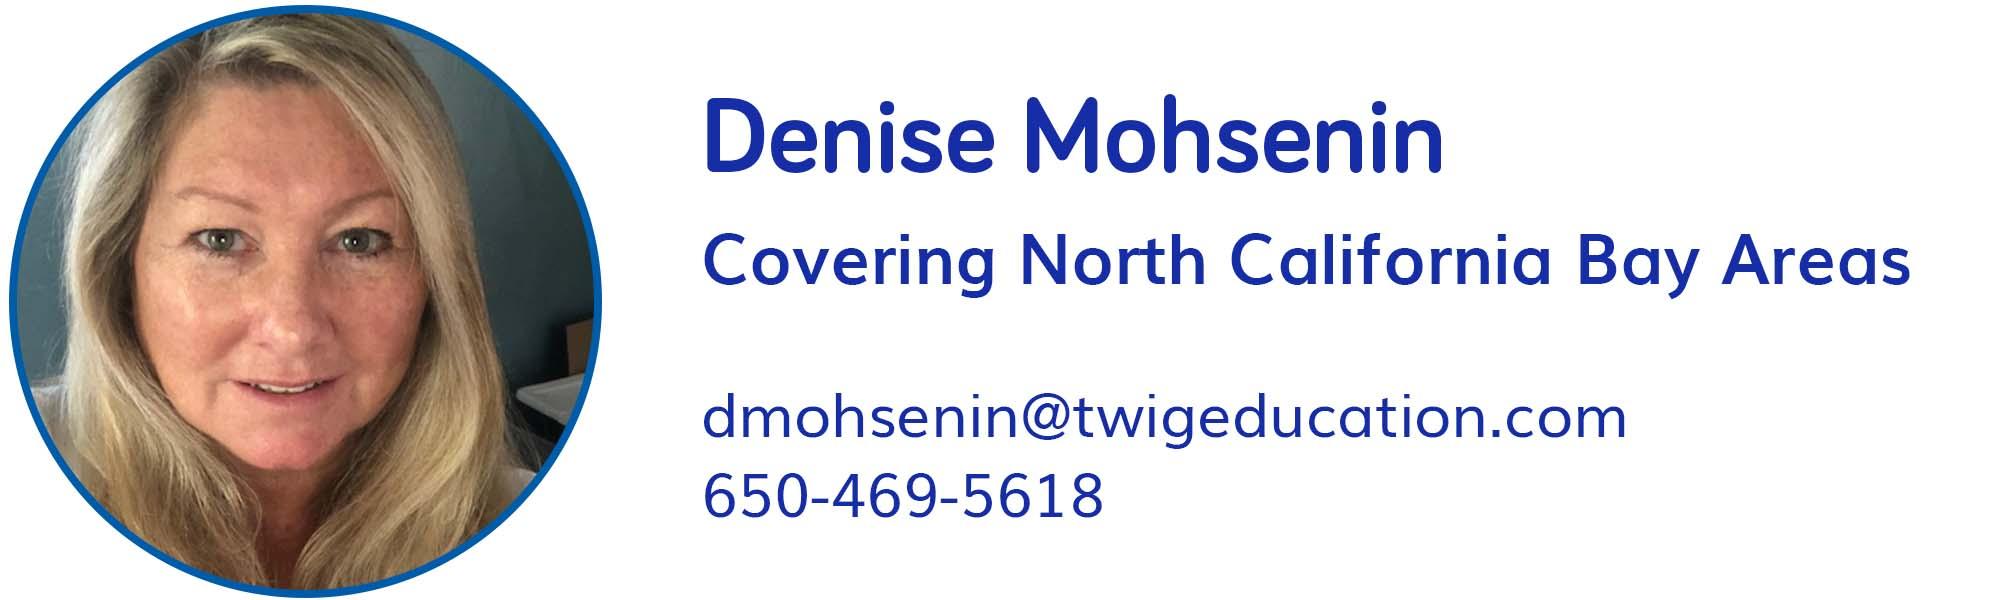 Denise Mohsenin, dmohsenin@twigeducation.com, 650-469-5618